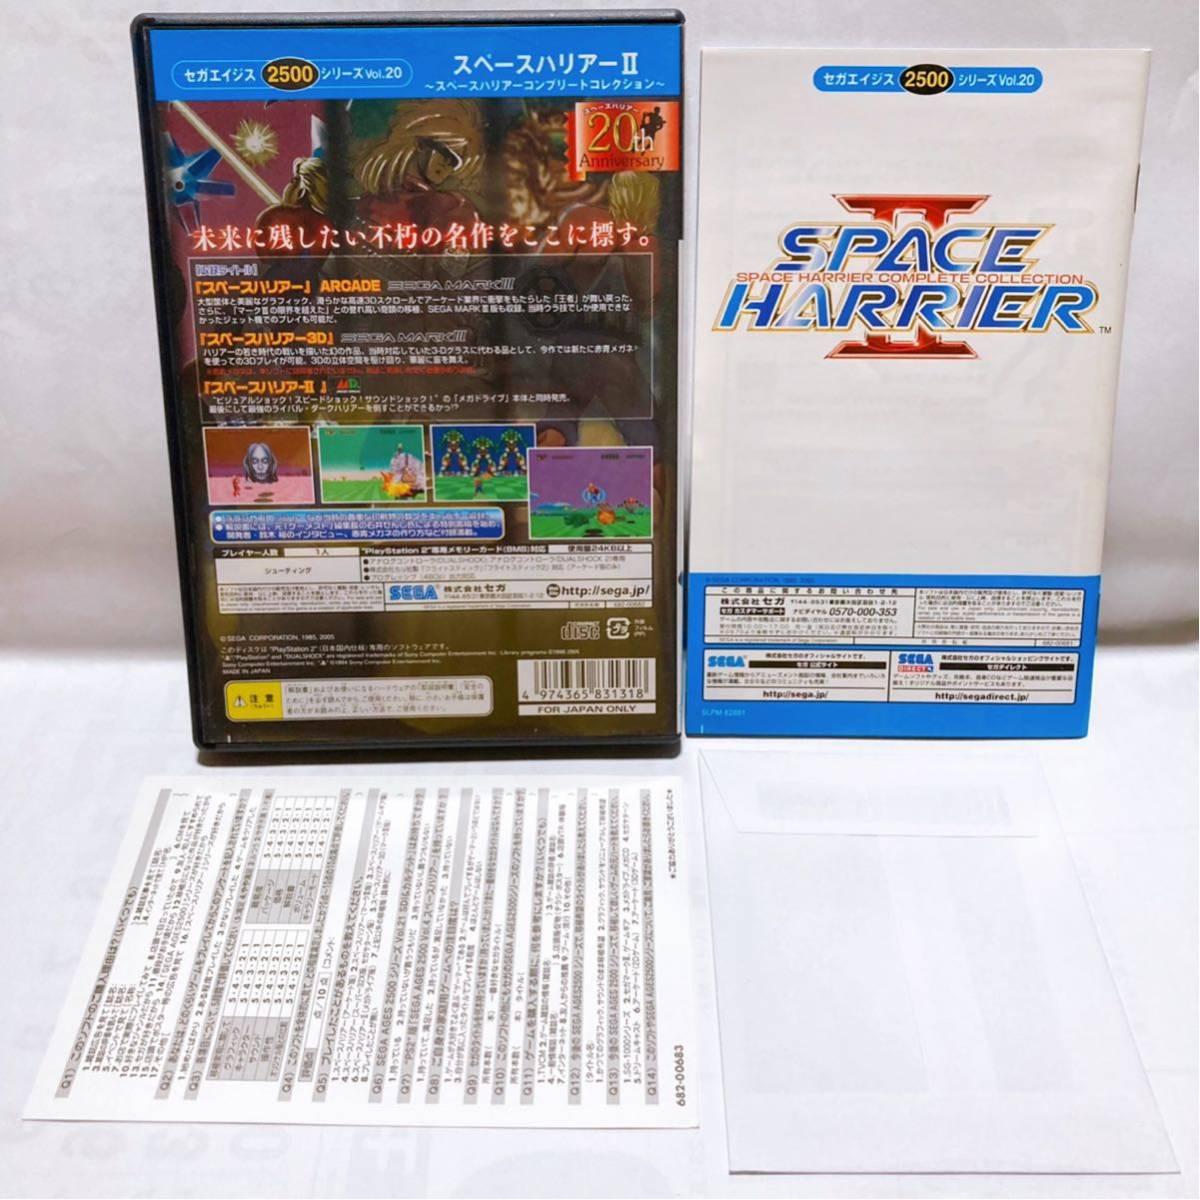 PS2 スペースハリアー2 ハガキ 特典付 【プレイステーション2 プレステ2 SPACE HARRIERⅡ】